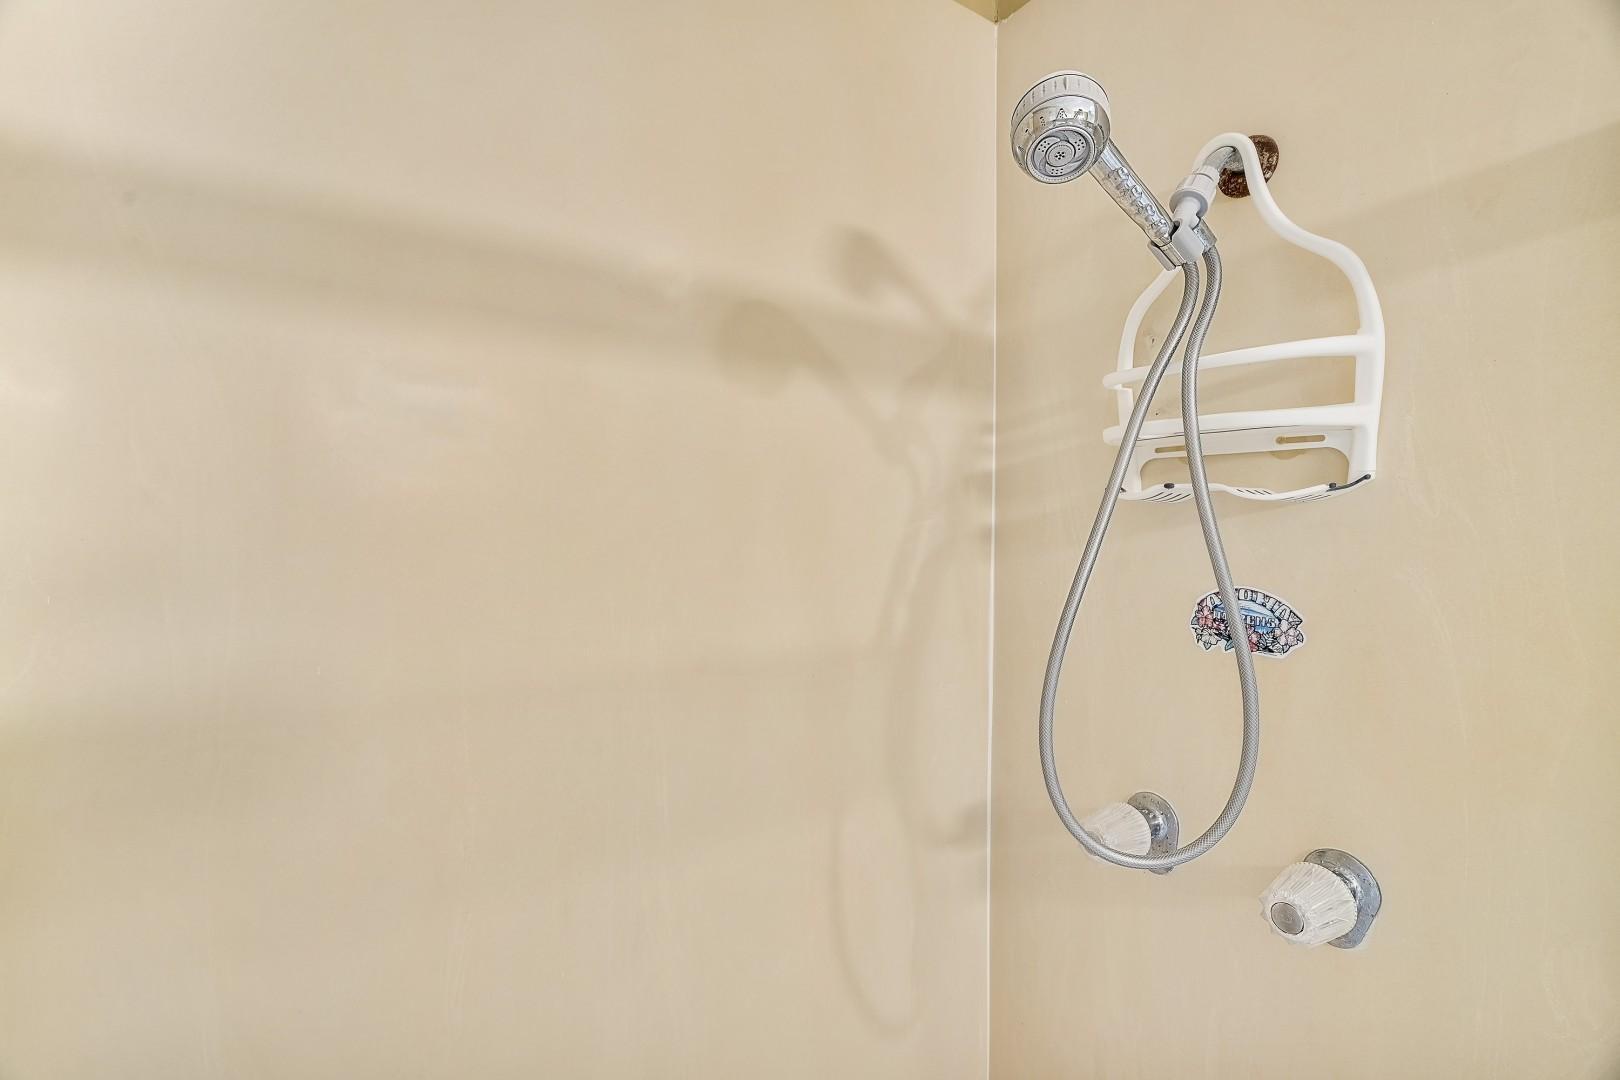 Primary tub/shower